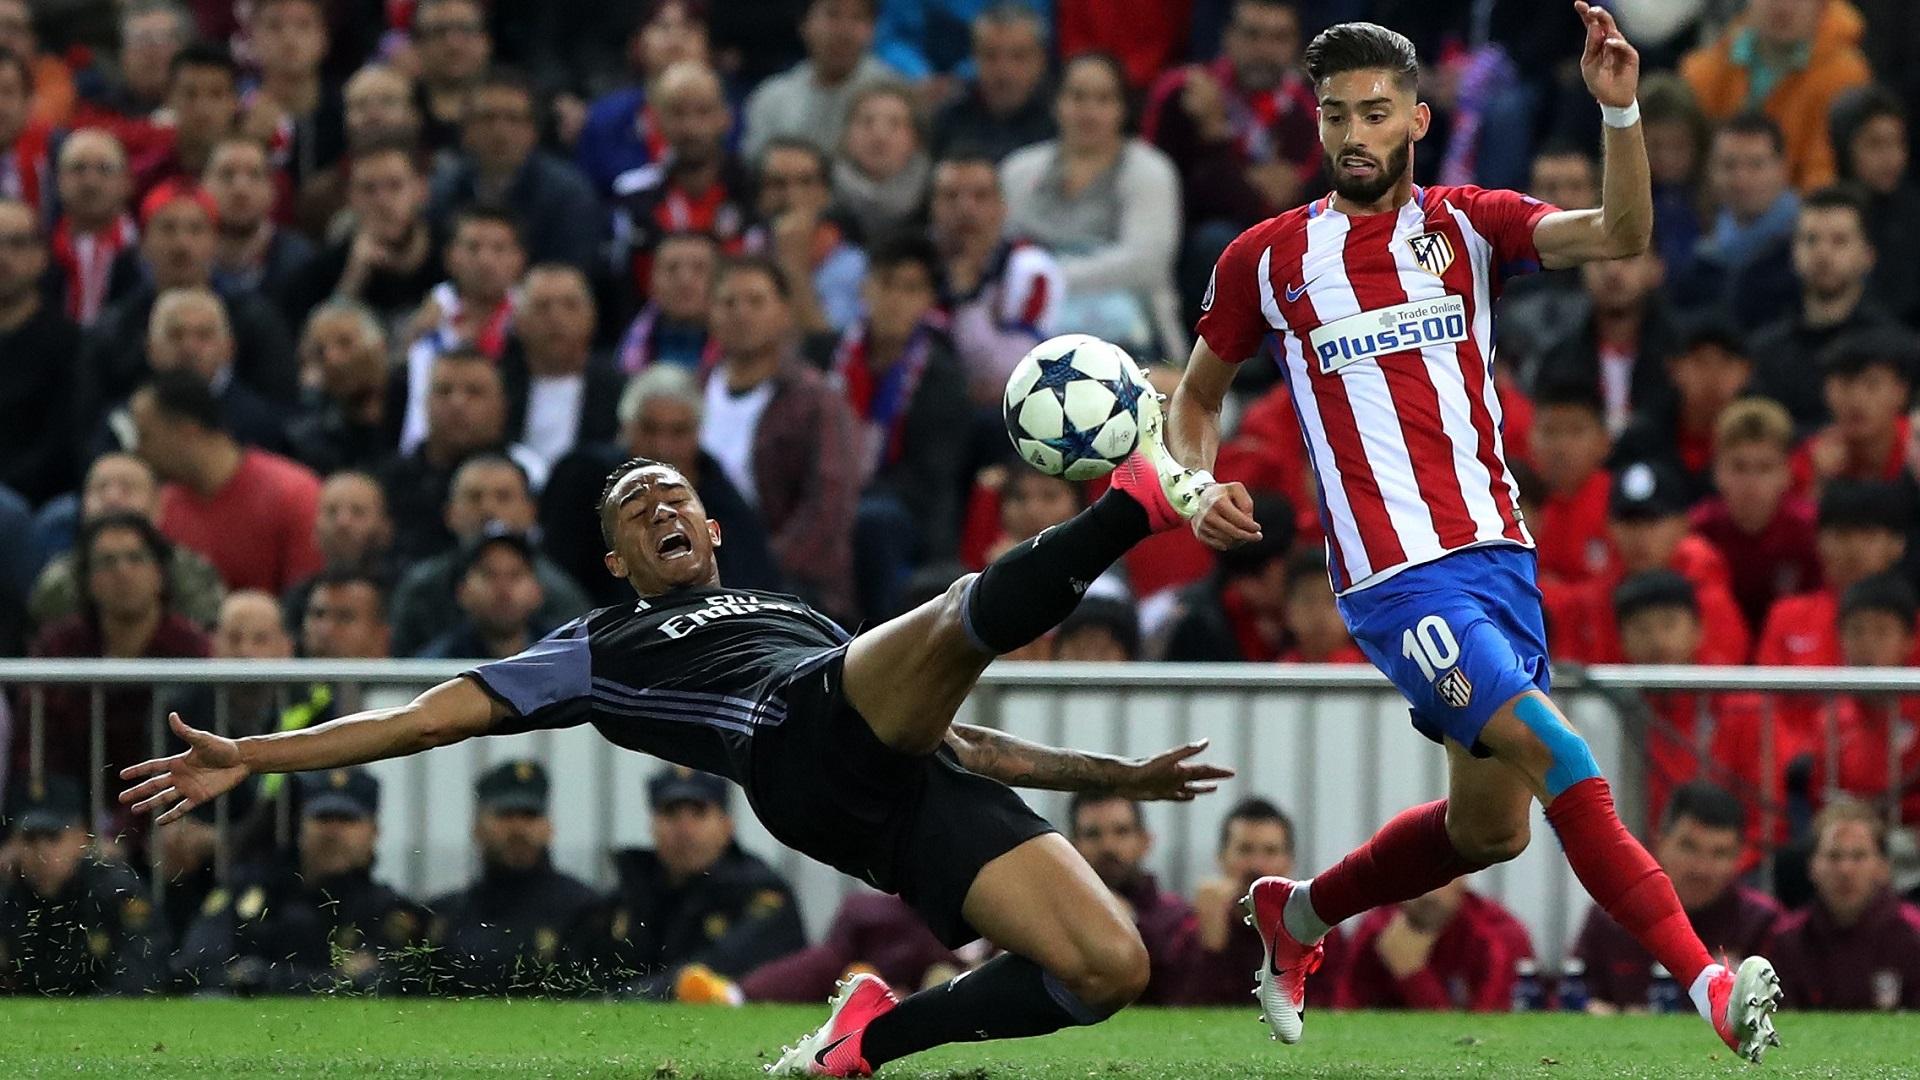 Danilo Pereira Yannick Carrasco Atletico Real Madrid UCL 10052017